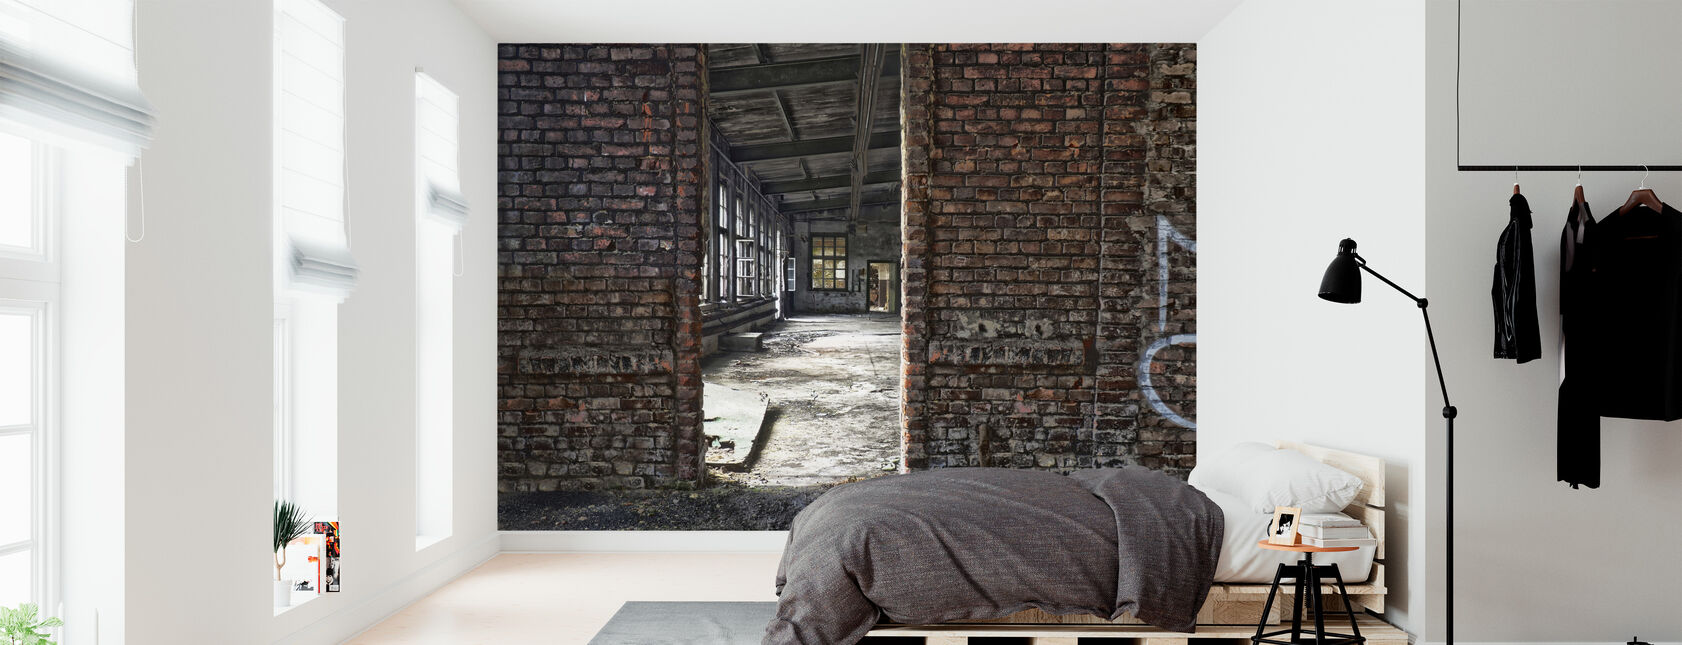 Factory Brick Wall - Wallpaper - Bedroom